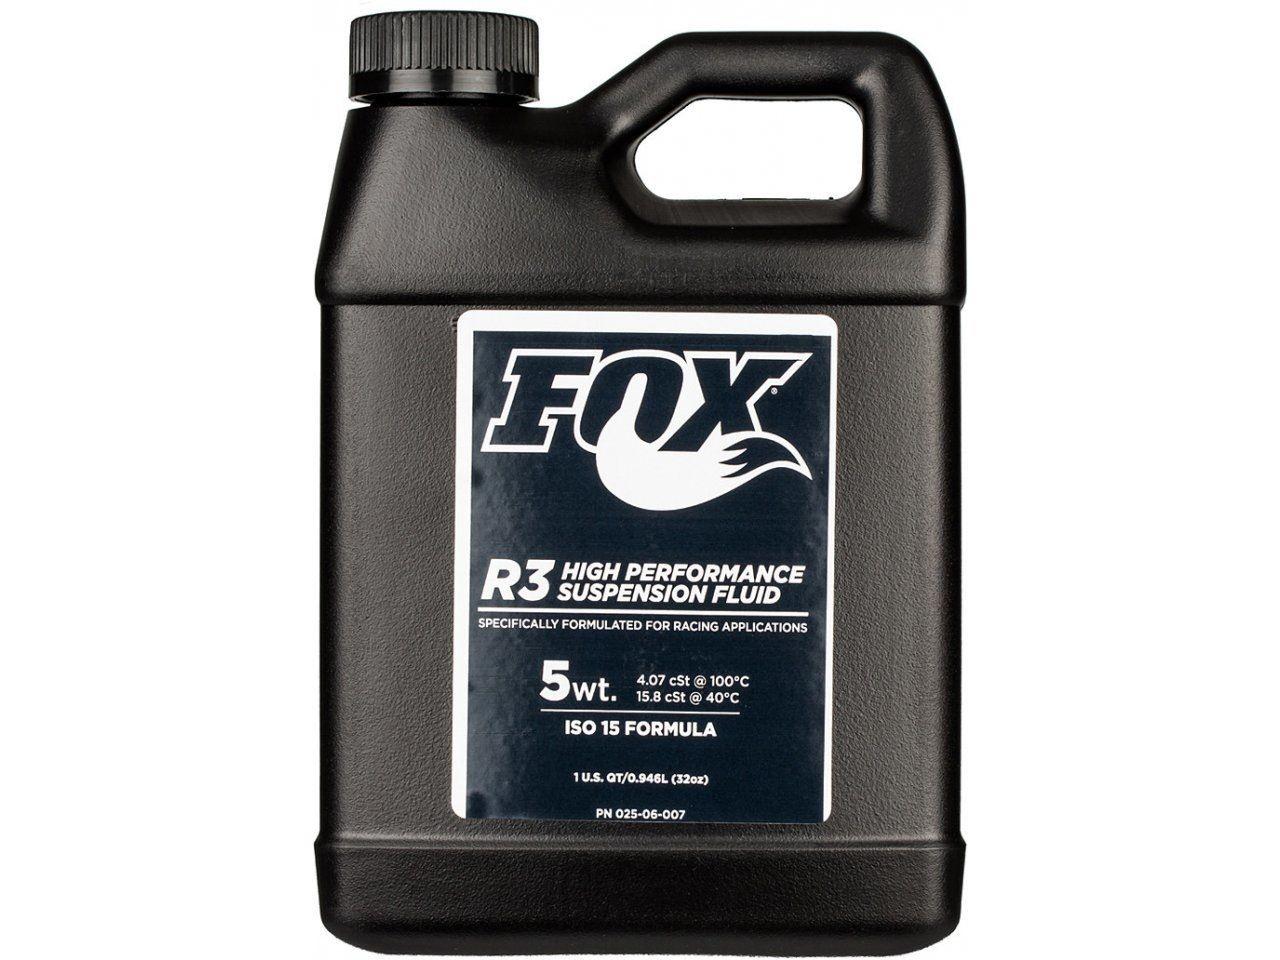 Fox-Racing-Shox-R3-5-WT-Suspension-Fluid-44546-0-1481256277.jpeg